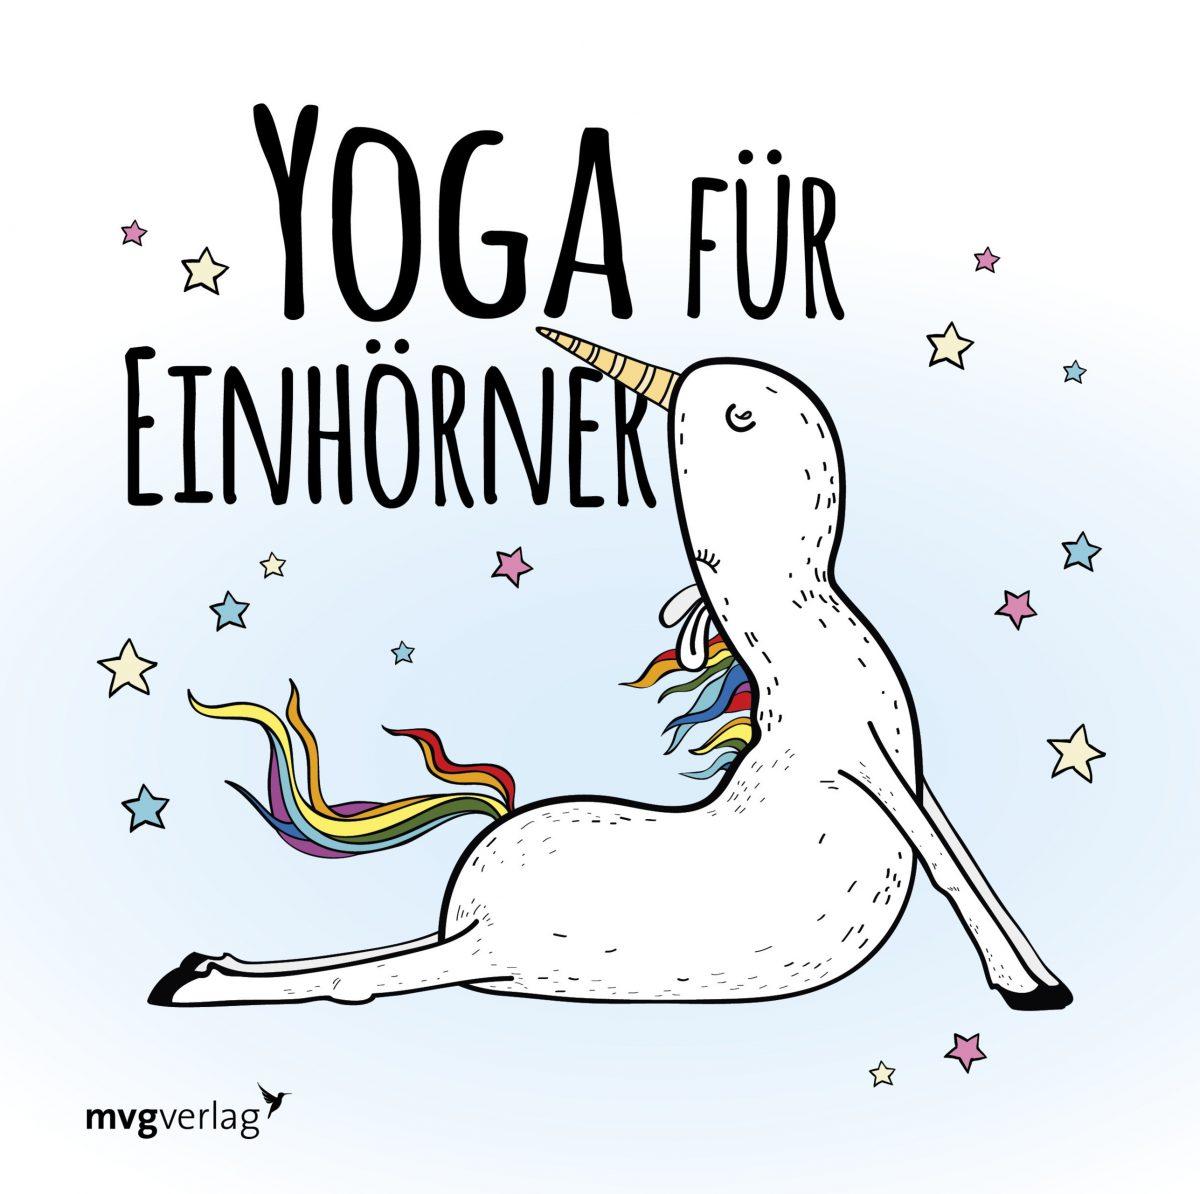 Yoga für Einhörner: Süße und rosarote Yoga-Anleitung